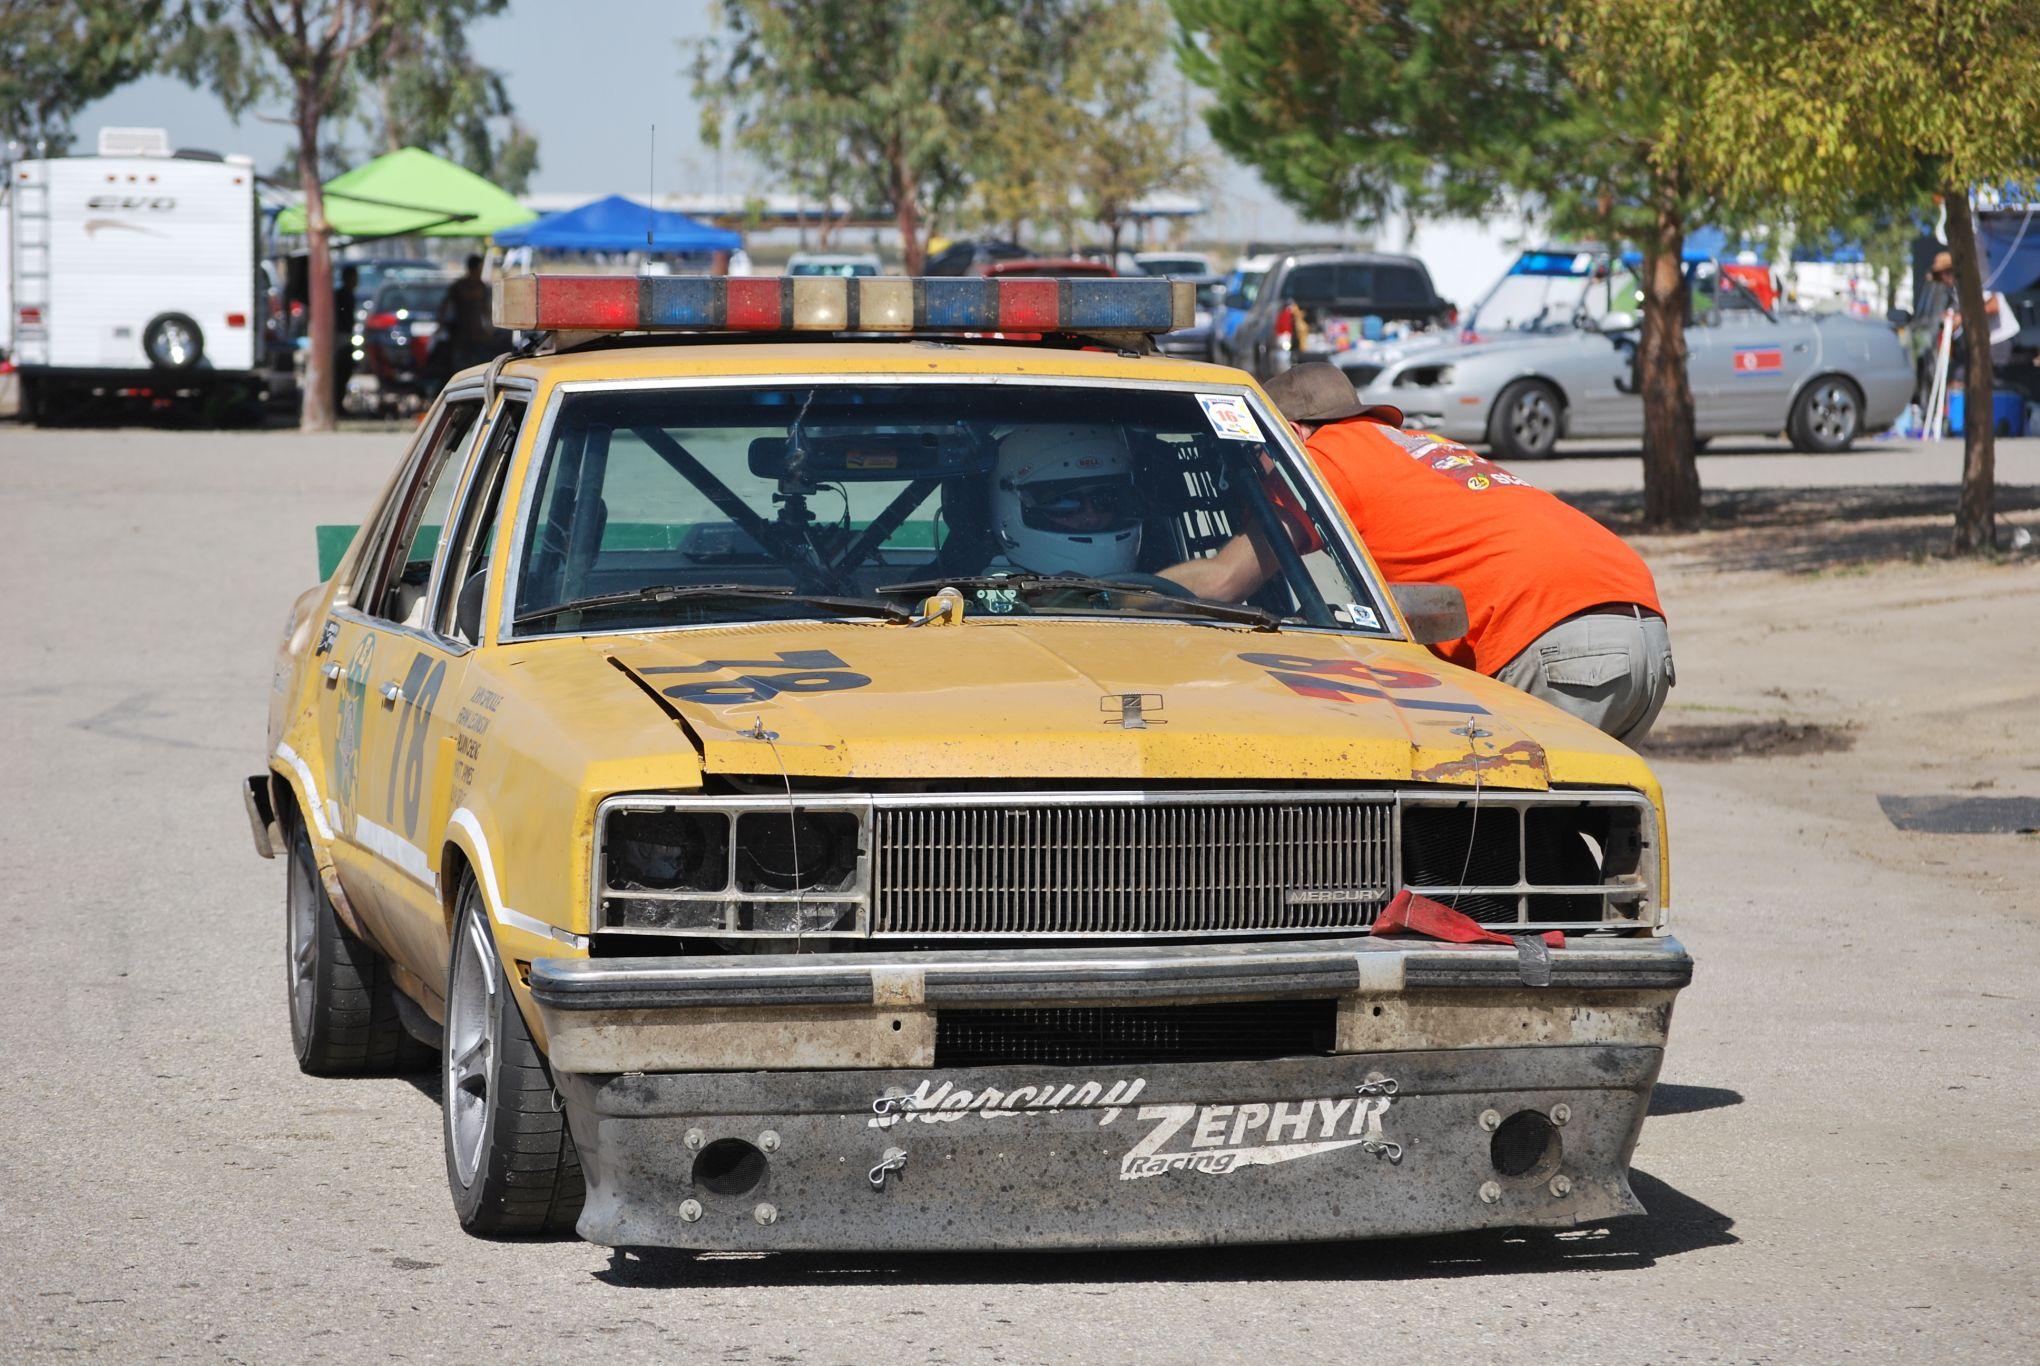 Lemons Mercury Zephyr racing